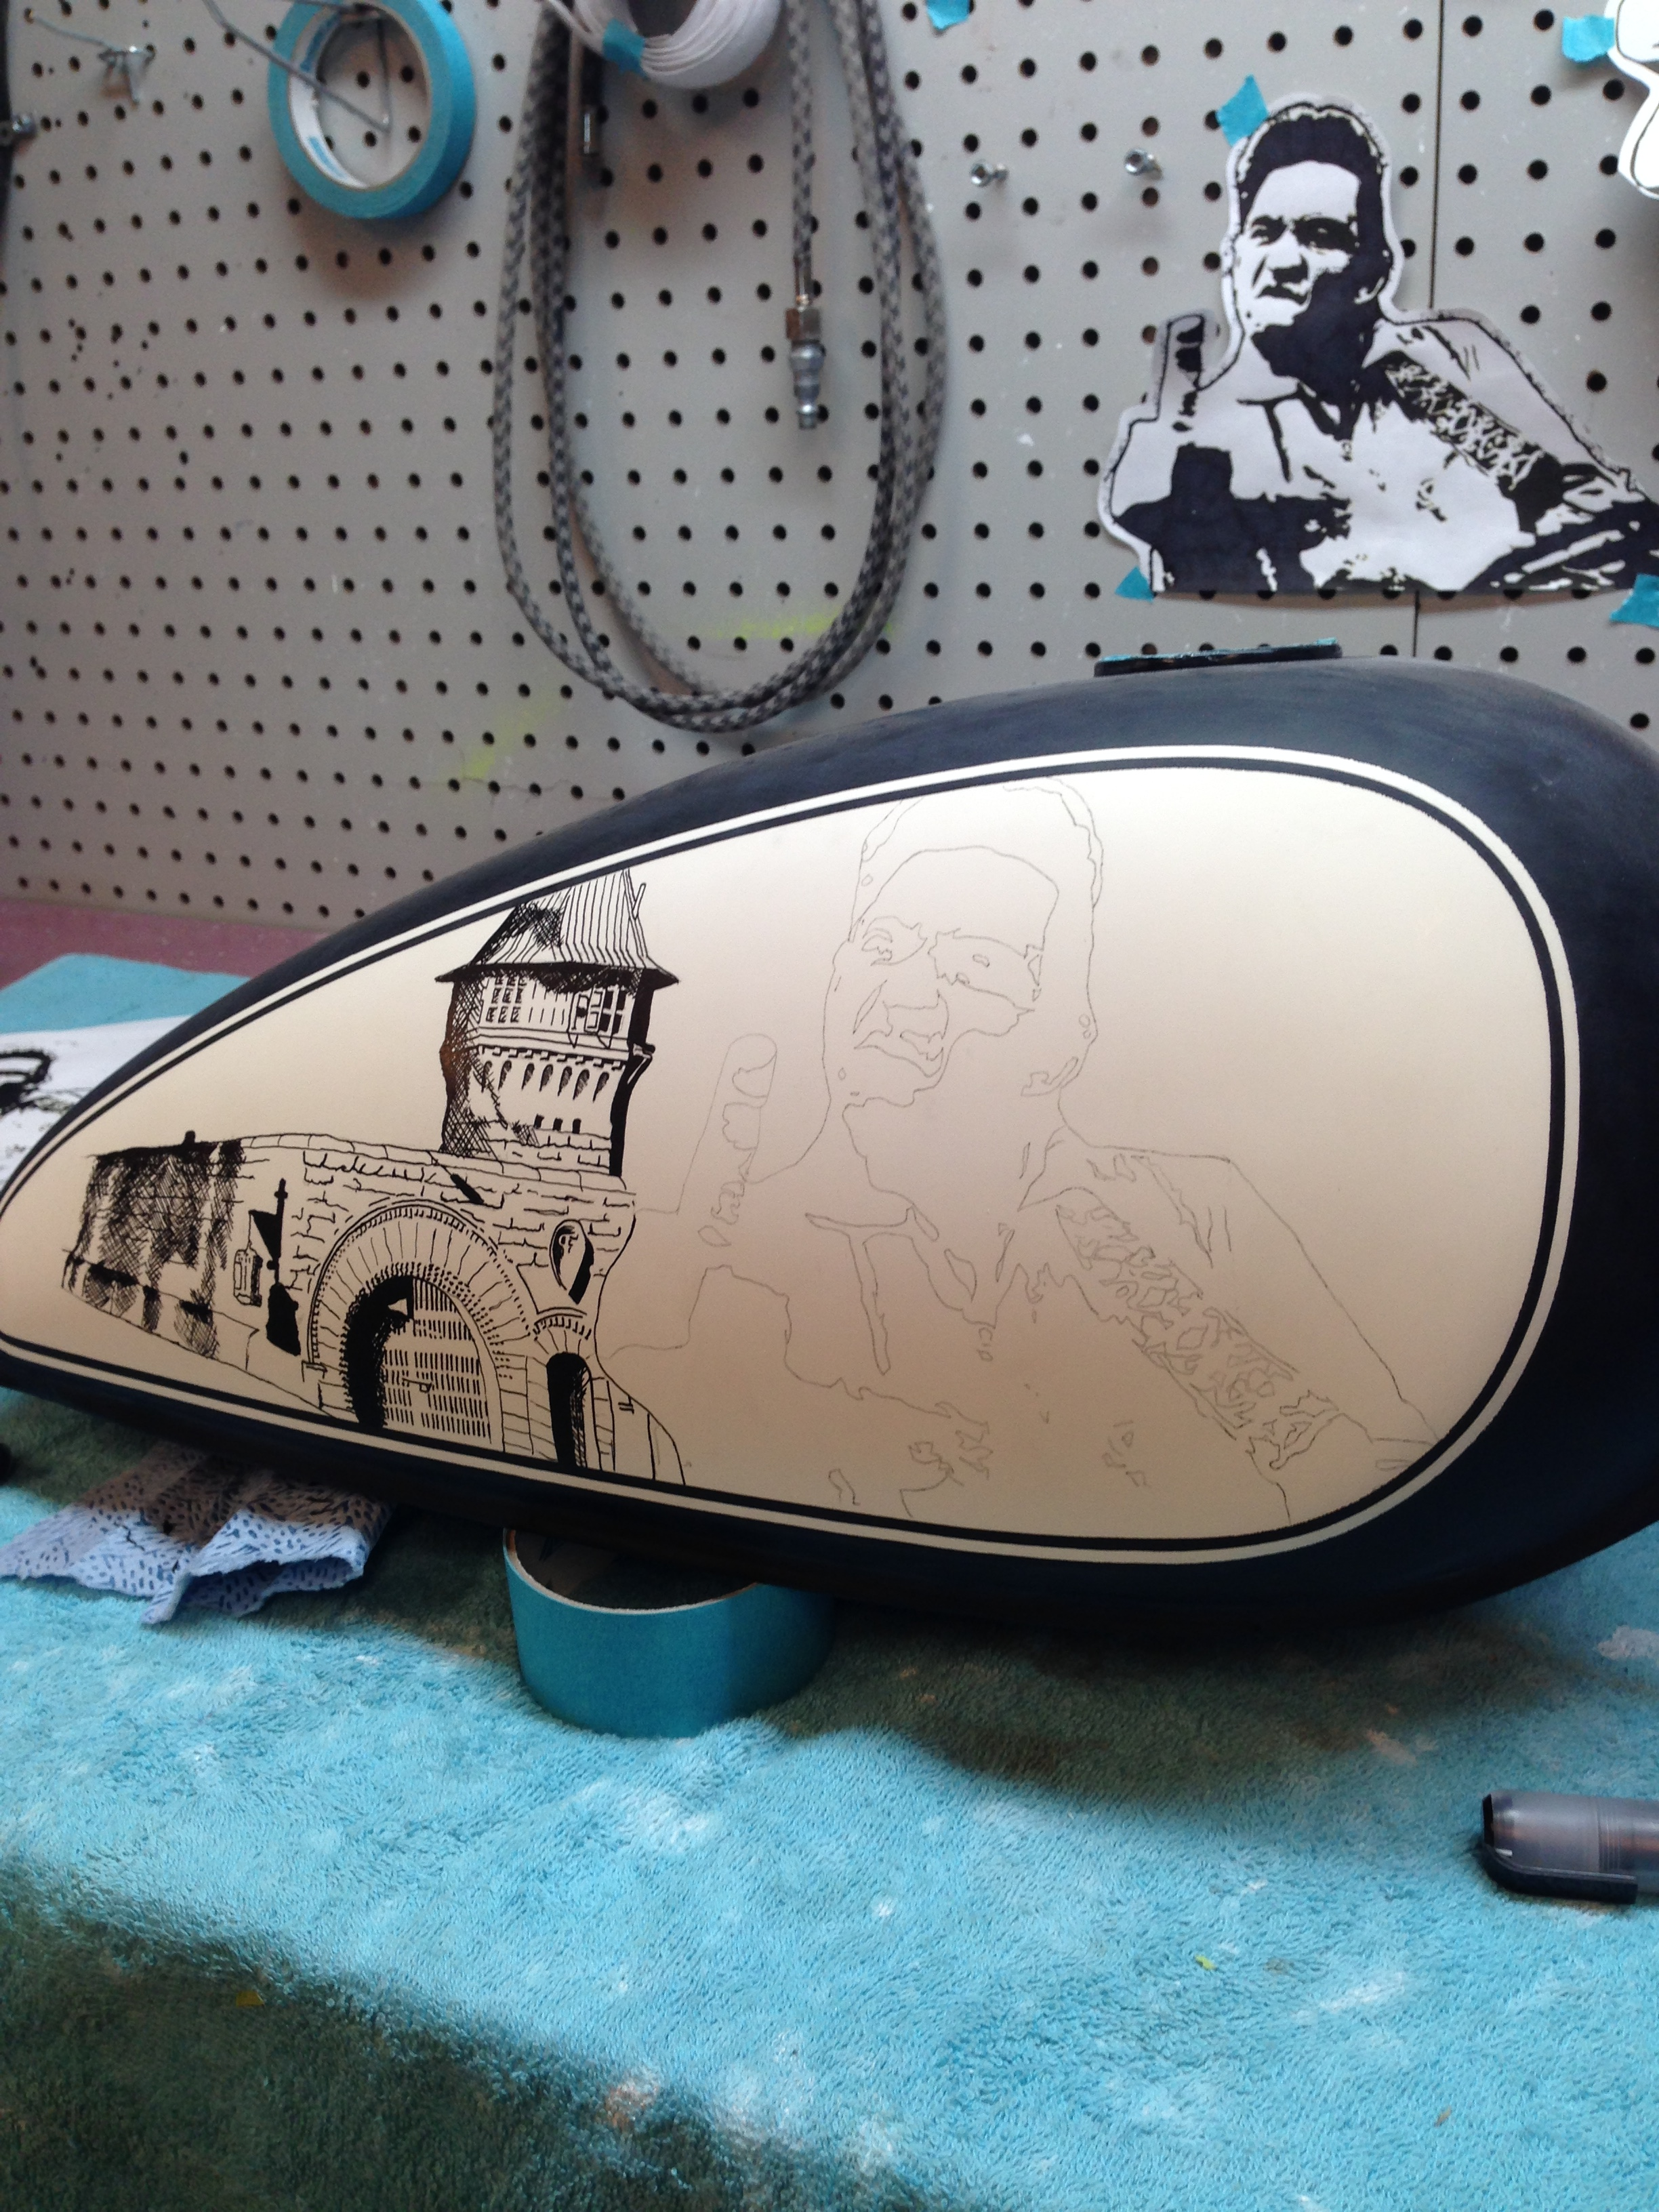 custom jonny cash johnny cash tank from Sketchs Ink paint shop Ottawa